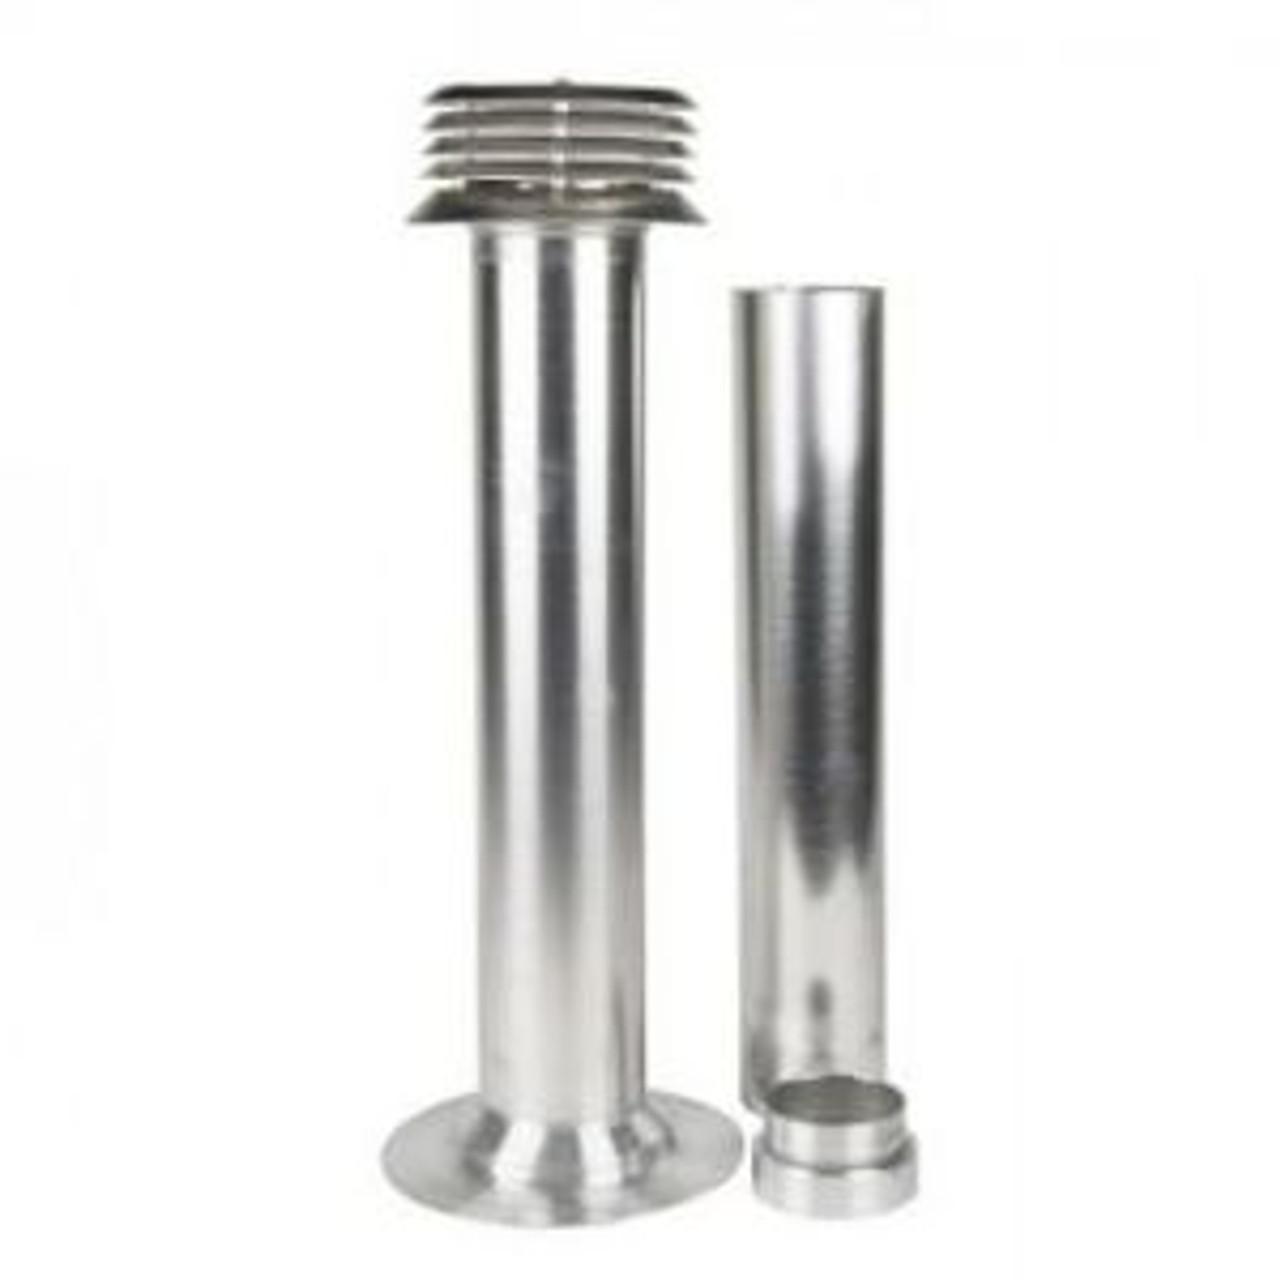 Flue Kit For Forcali 6 Litre Caravan Motorhome Water Heater